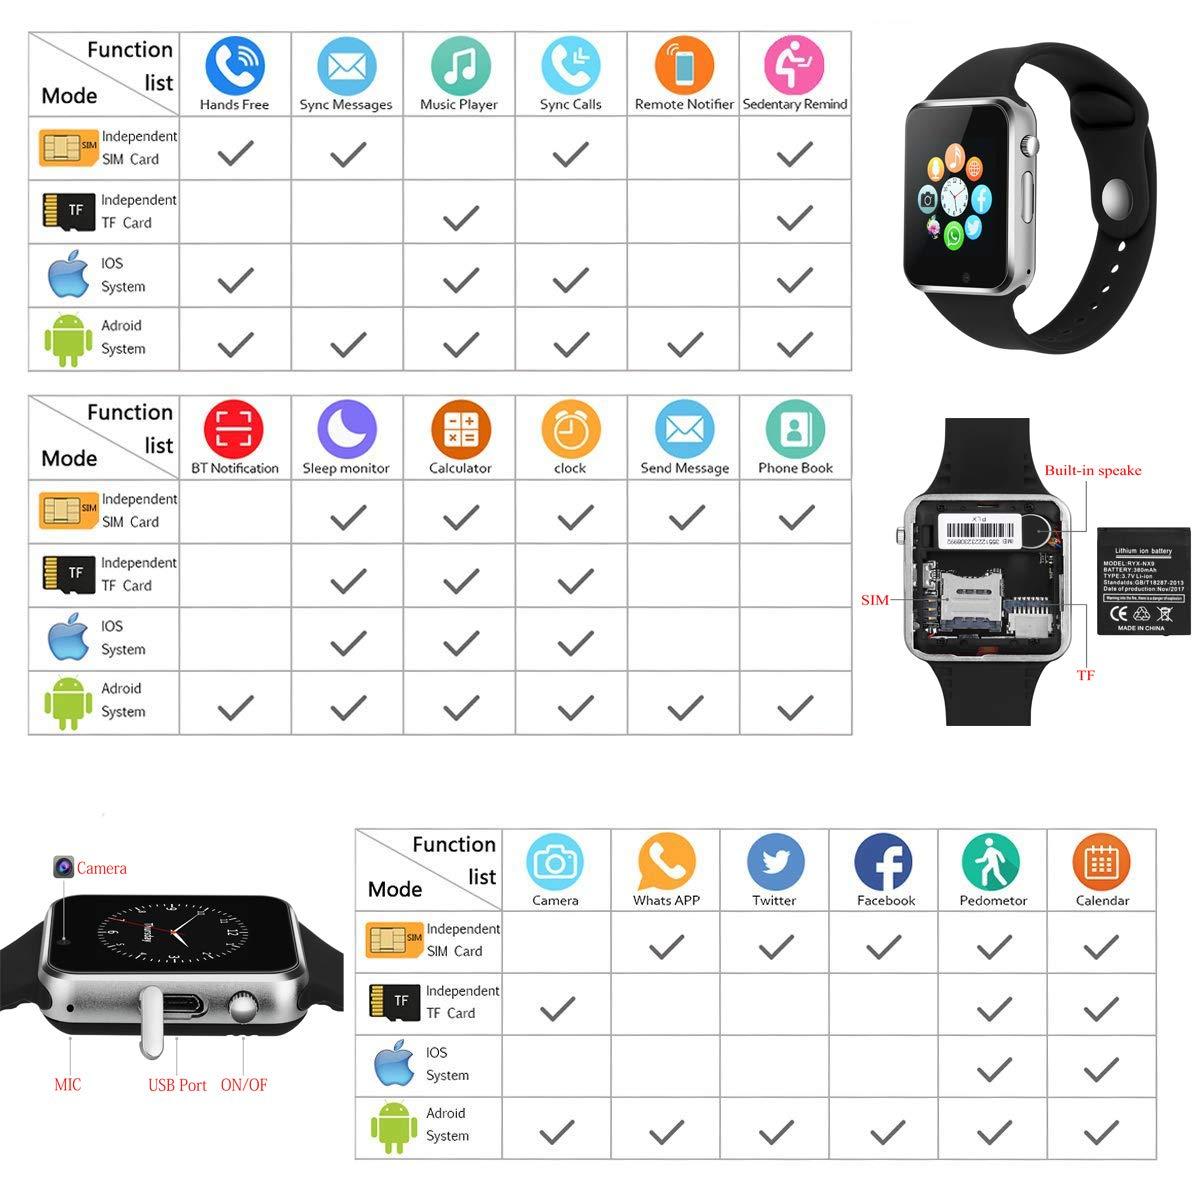 Smart Watch Phone Camera, IOQSOF Touch Screen Smart Wristwatch, Bluetooth Smart Watch Cell Phone with 2G Sim Card Slot for Samsung, LG, HTC, Google, Sony Android IOS Smartphone Men Women Kids Boys